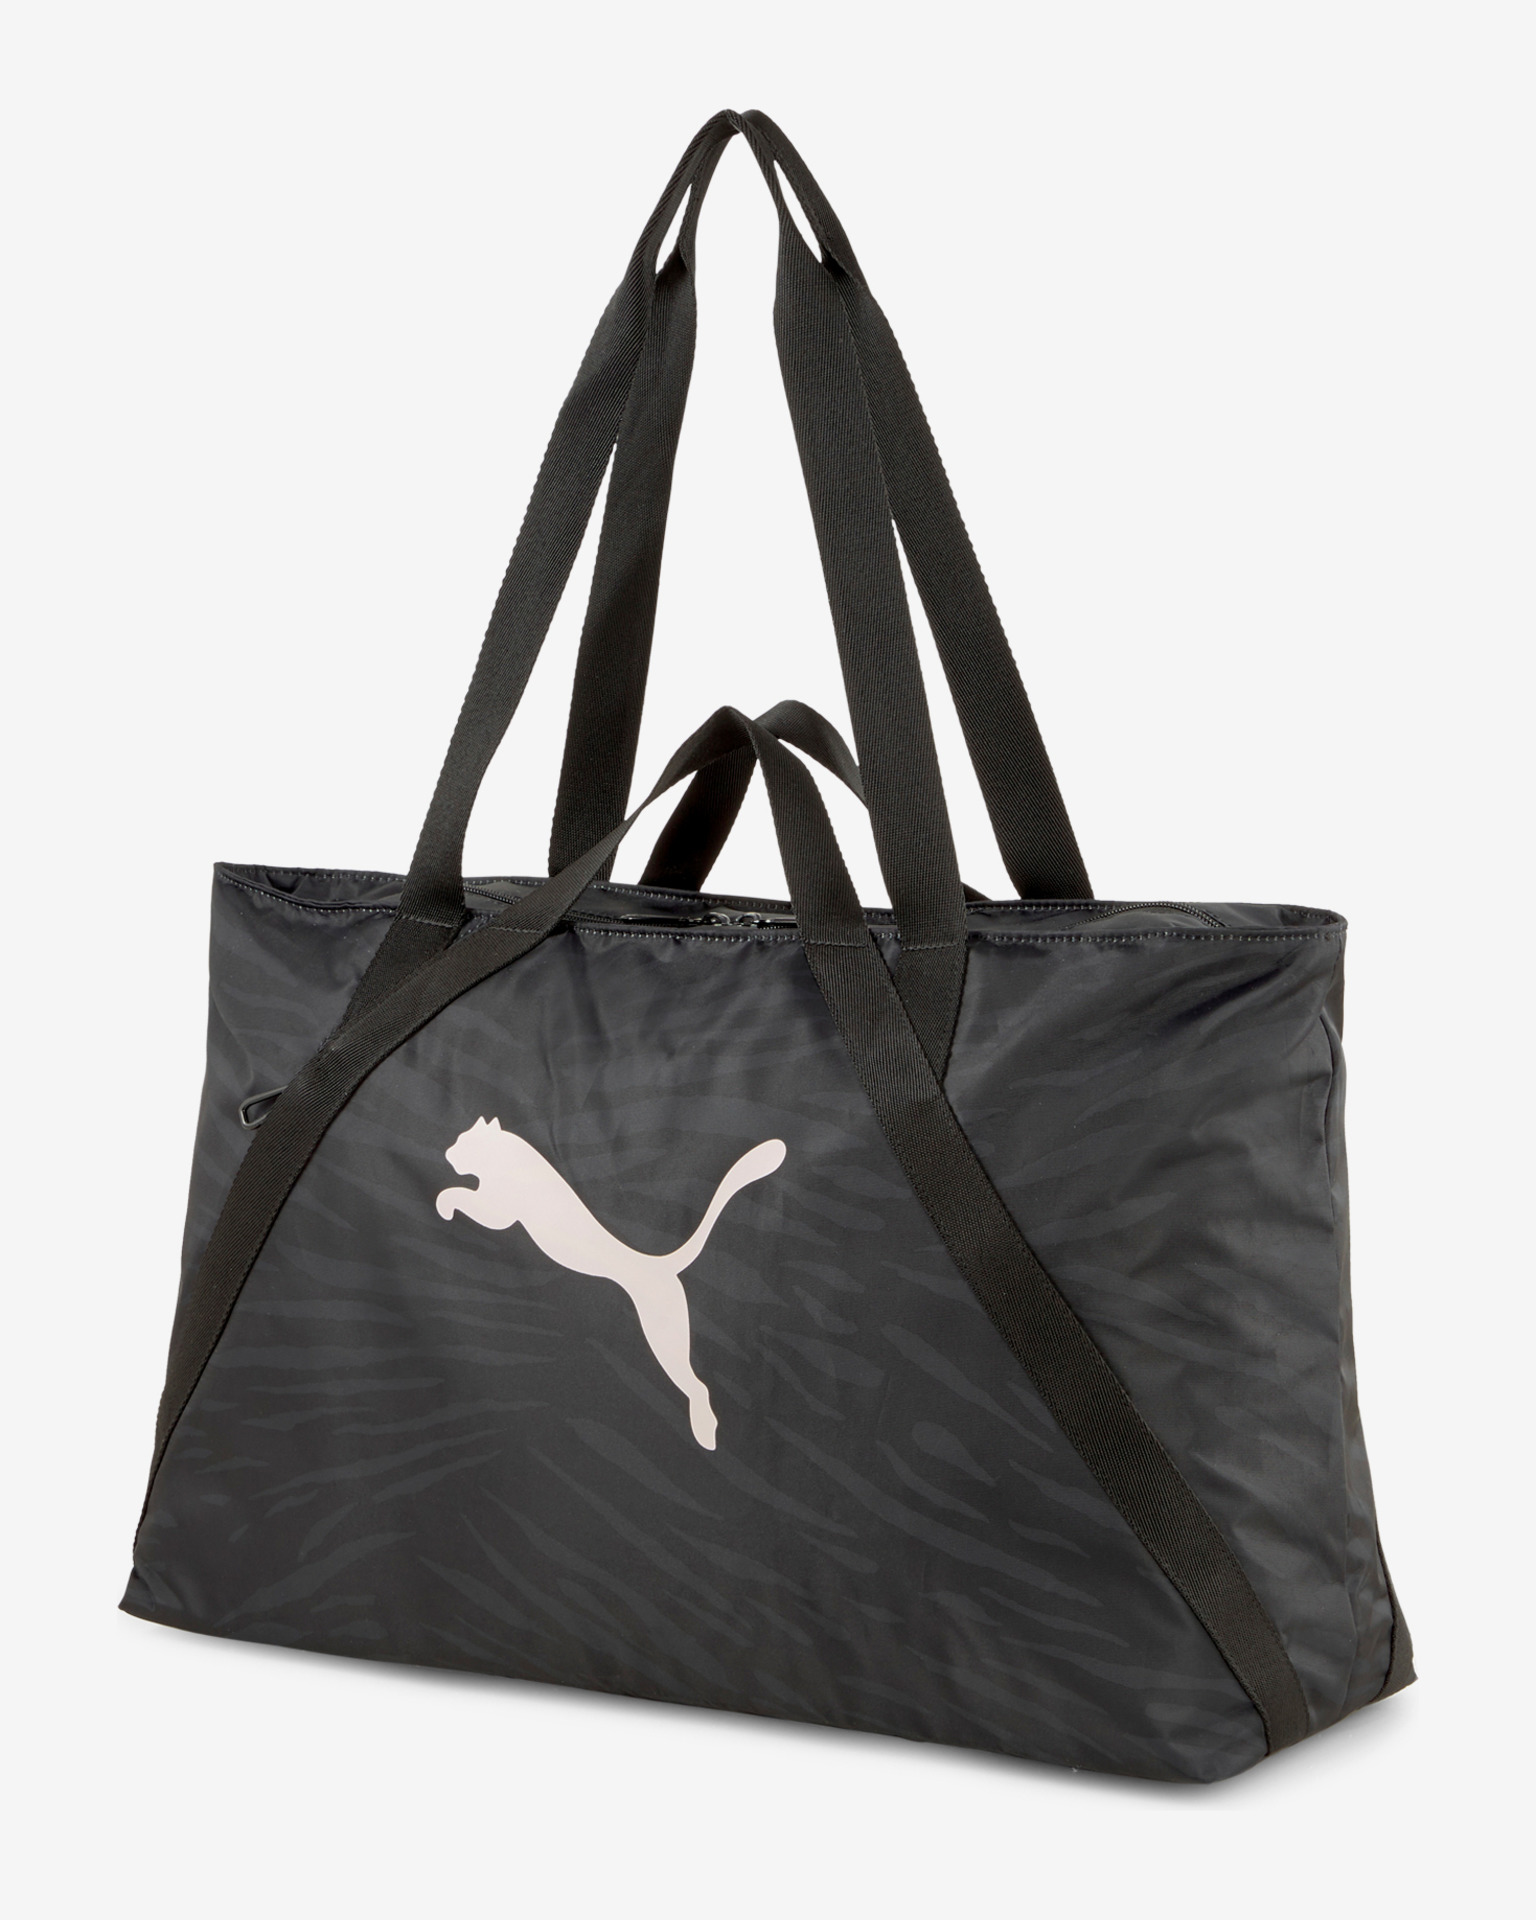 Puma Borsa donna nero